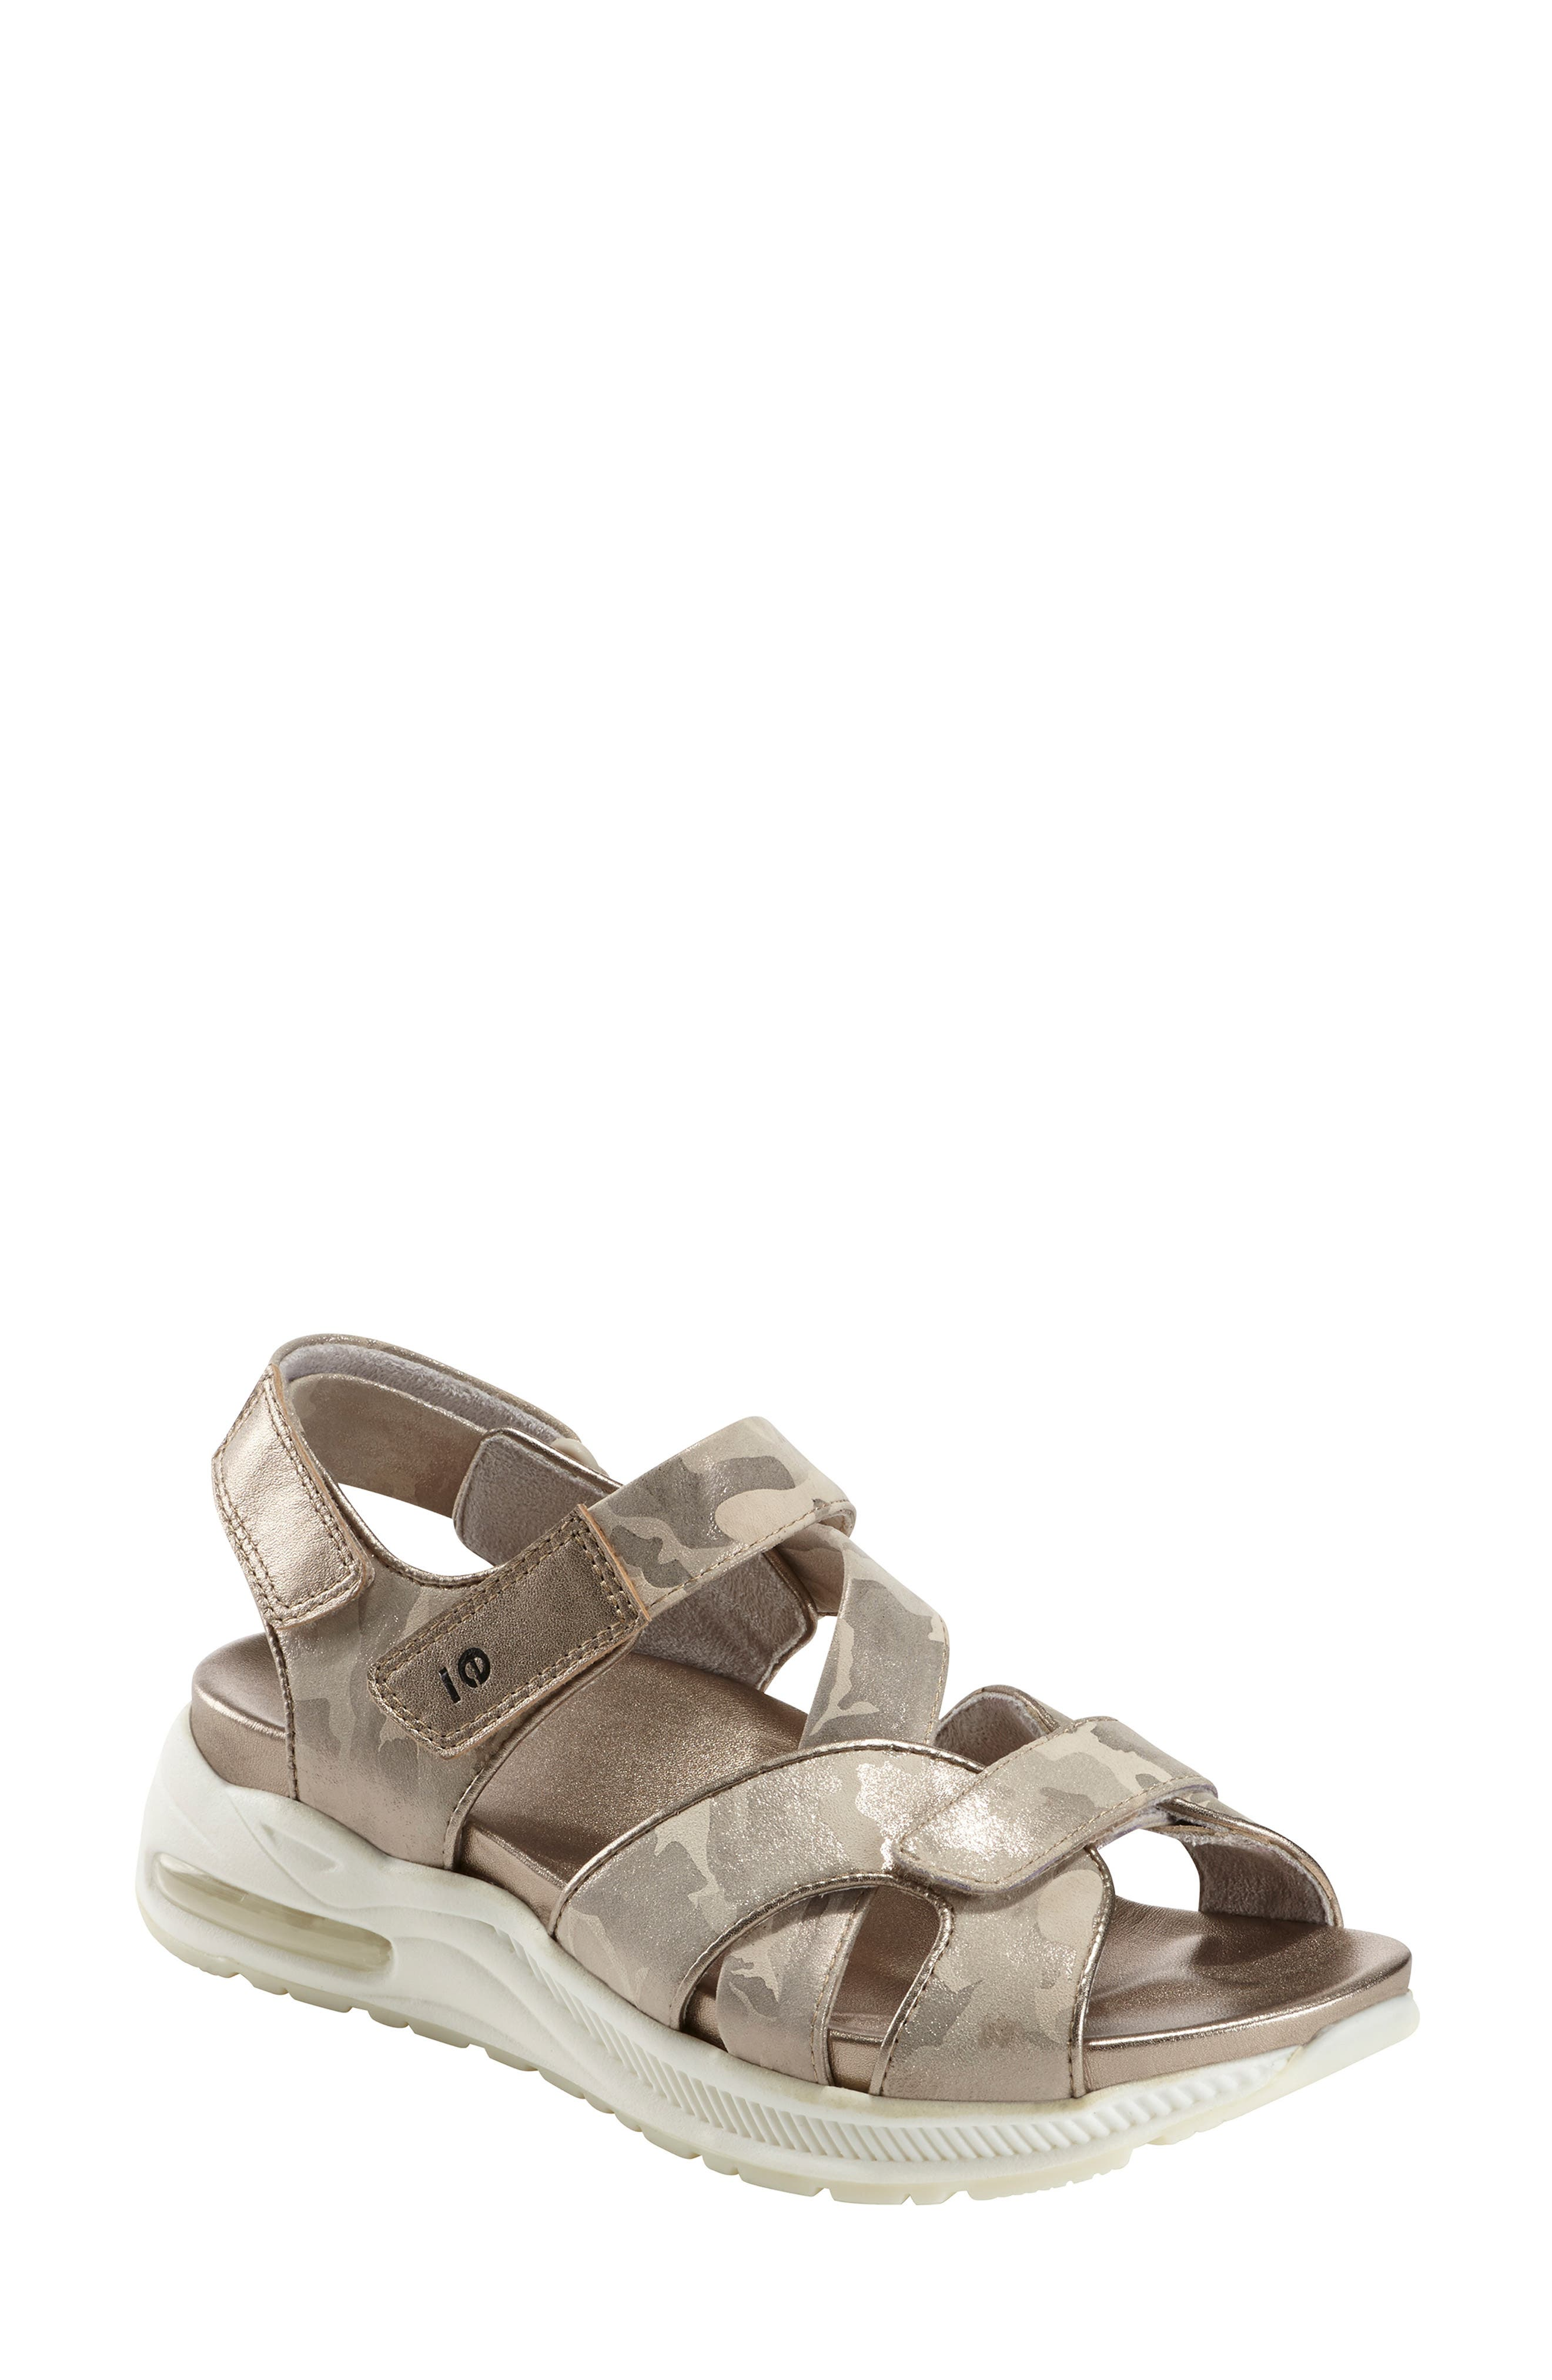 Earth Kushima Slingback Sandal, Metallic